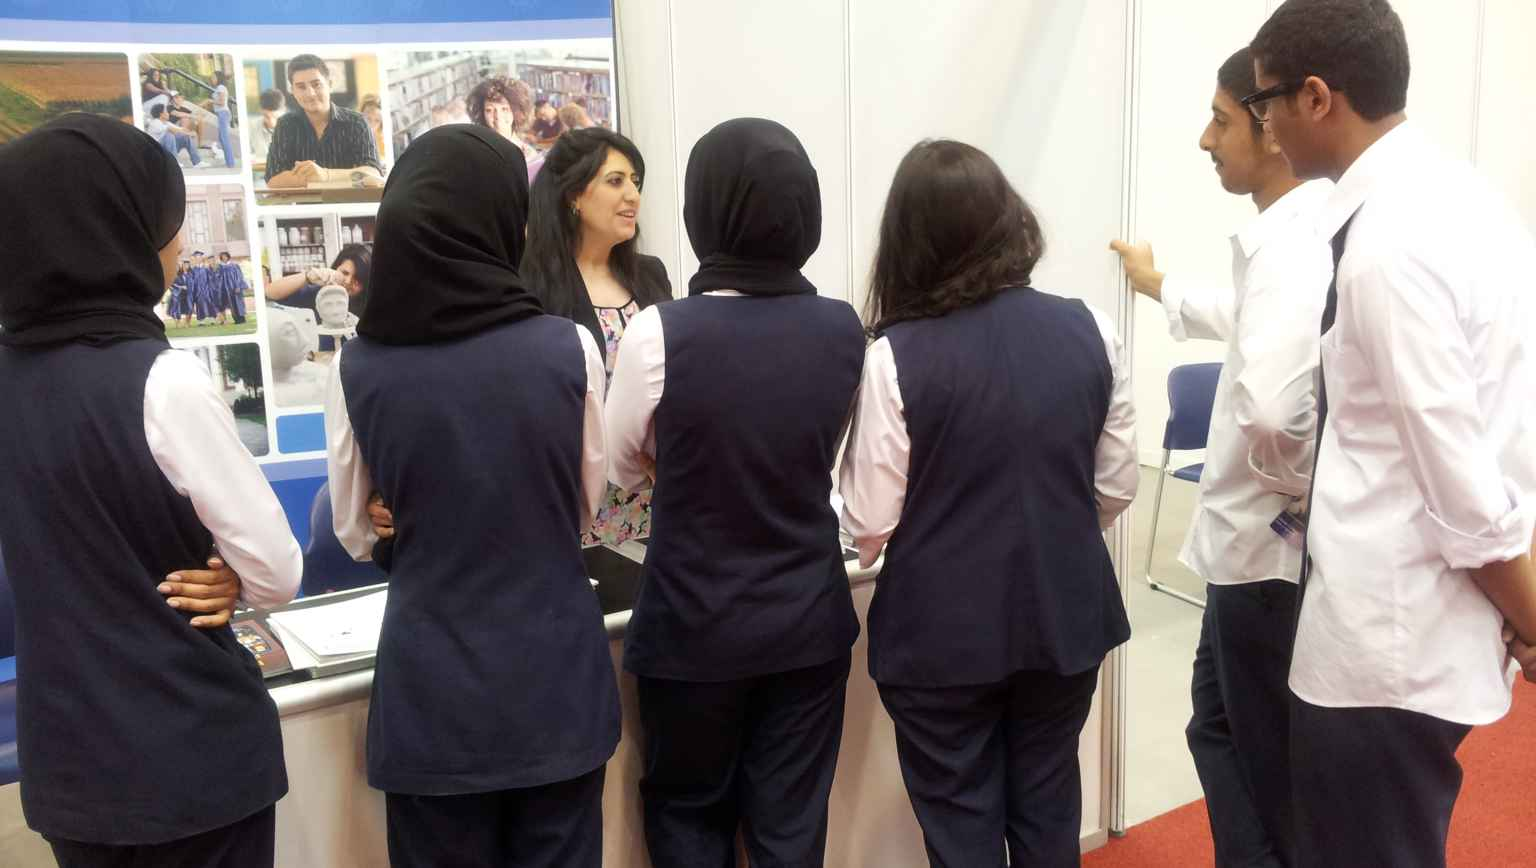 International Students at EducationUSA information session